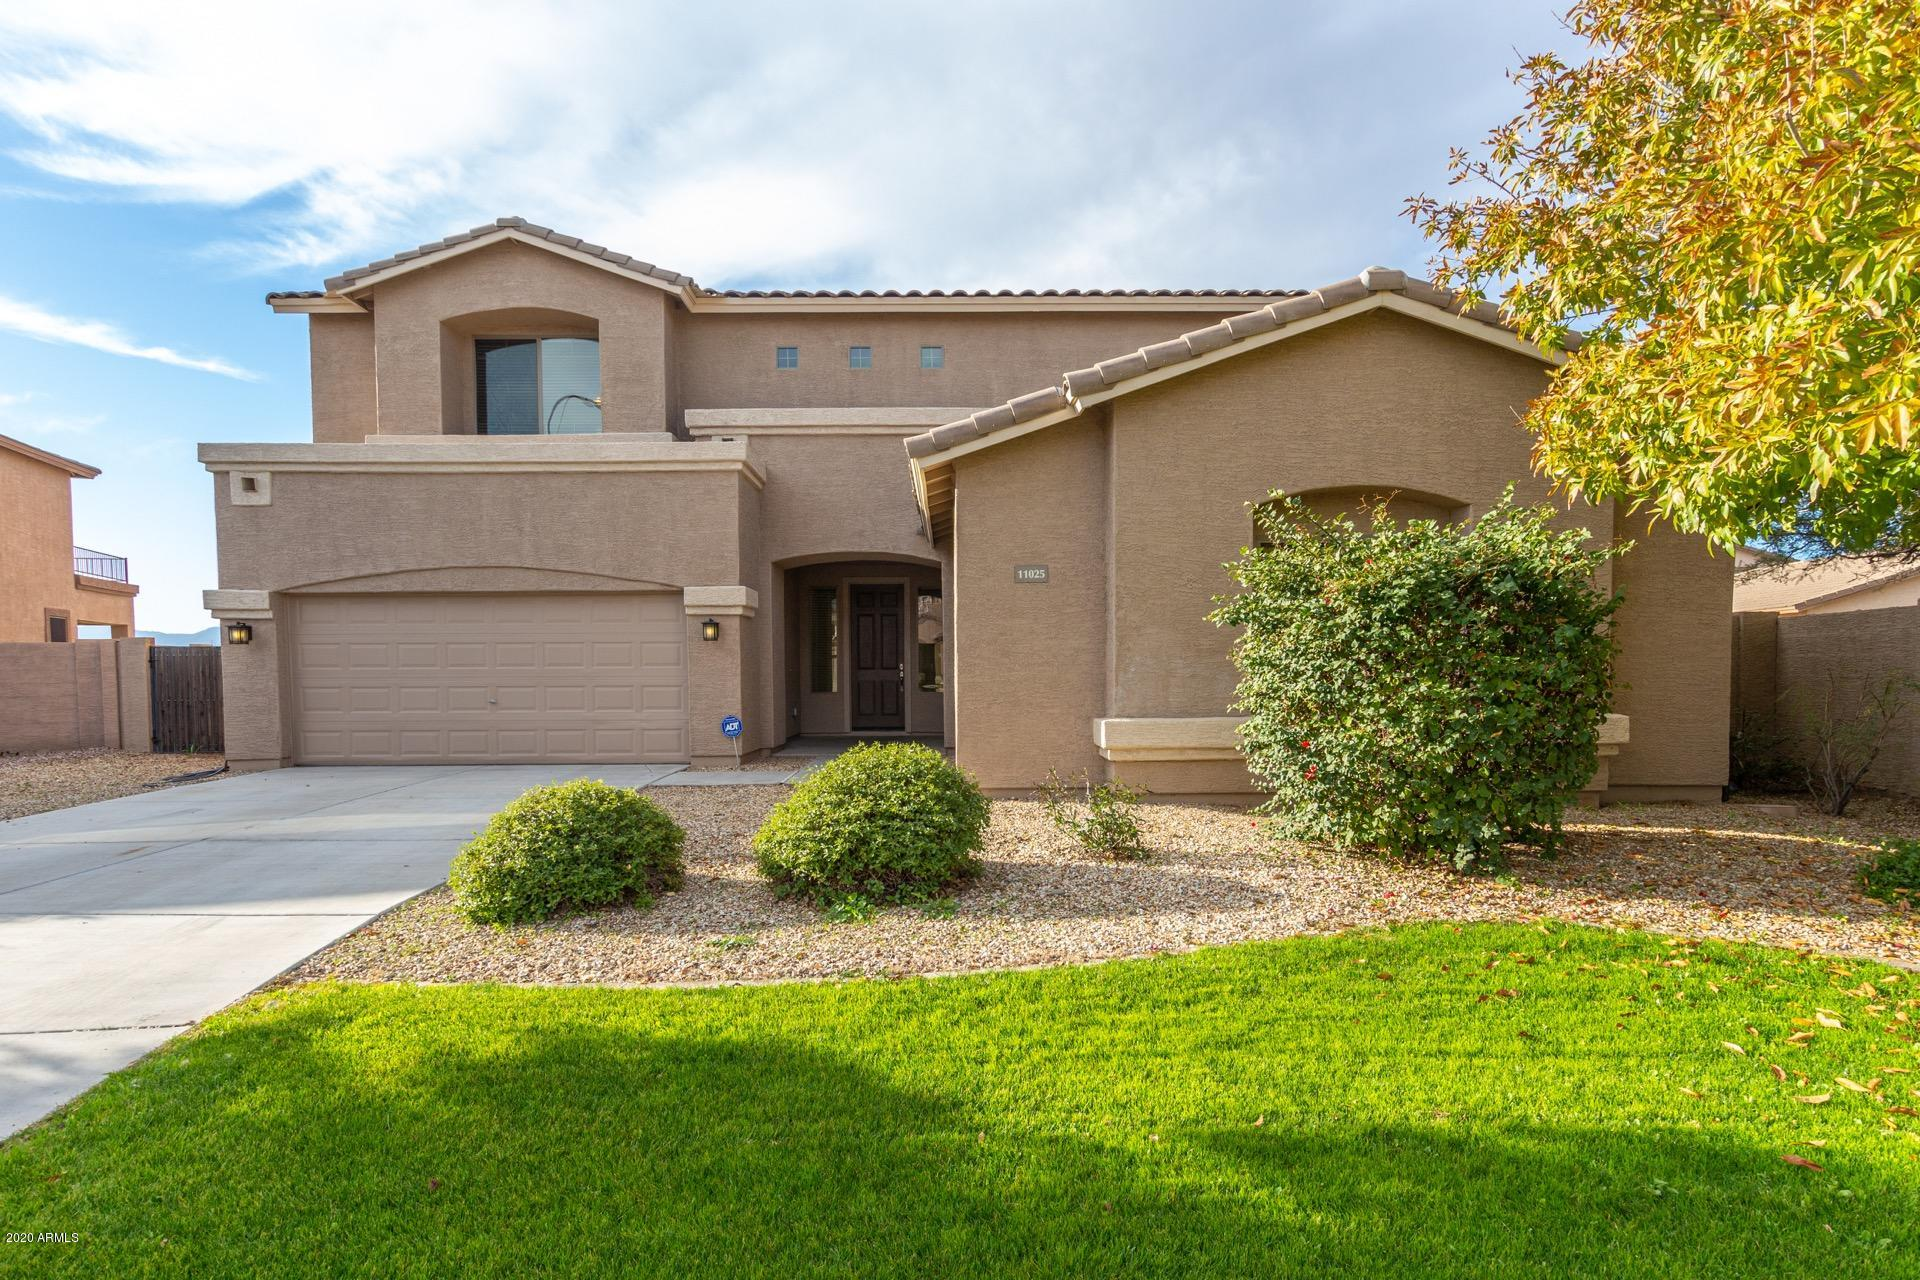 Photo of 11025 W MADISON Street, Avondale, AZ 85323